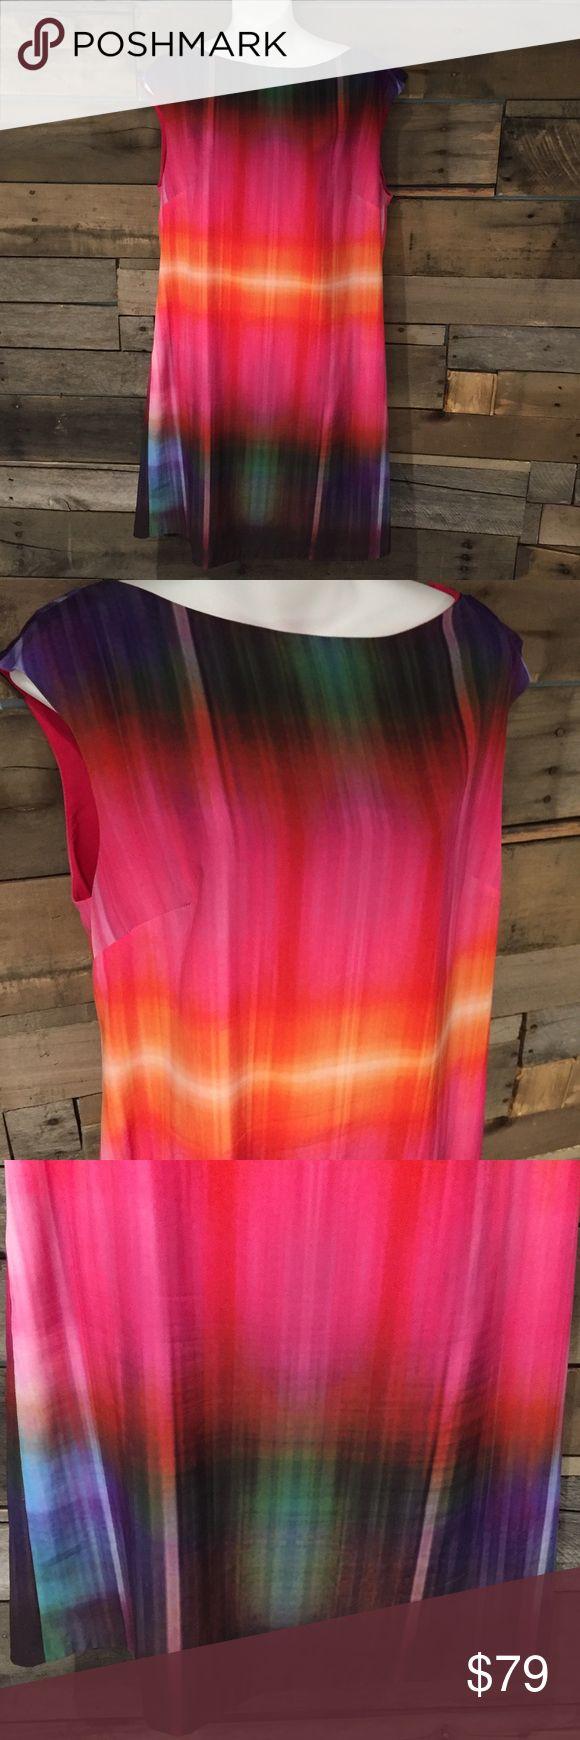 "Donna Morgan dip dye rainbow Shift dress. Size 14 Like new Donna Morgan dip dye rainbow sleeveless Shift dress. Size 14. 35"" long. Super soft polyester. Donna Morgan Dresses"